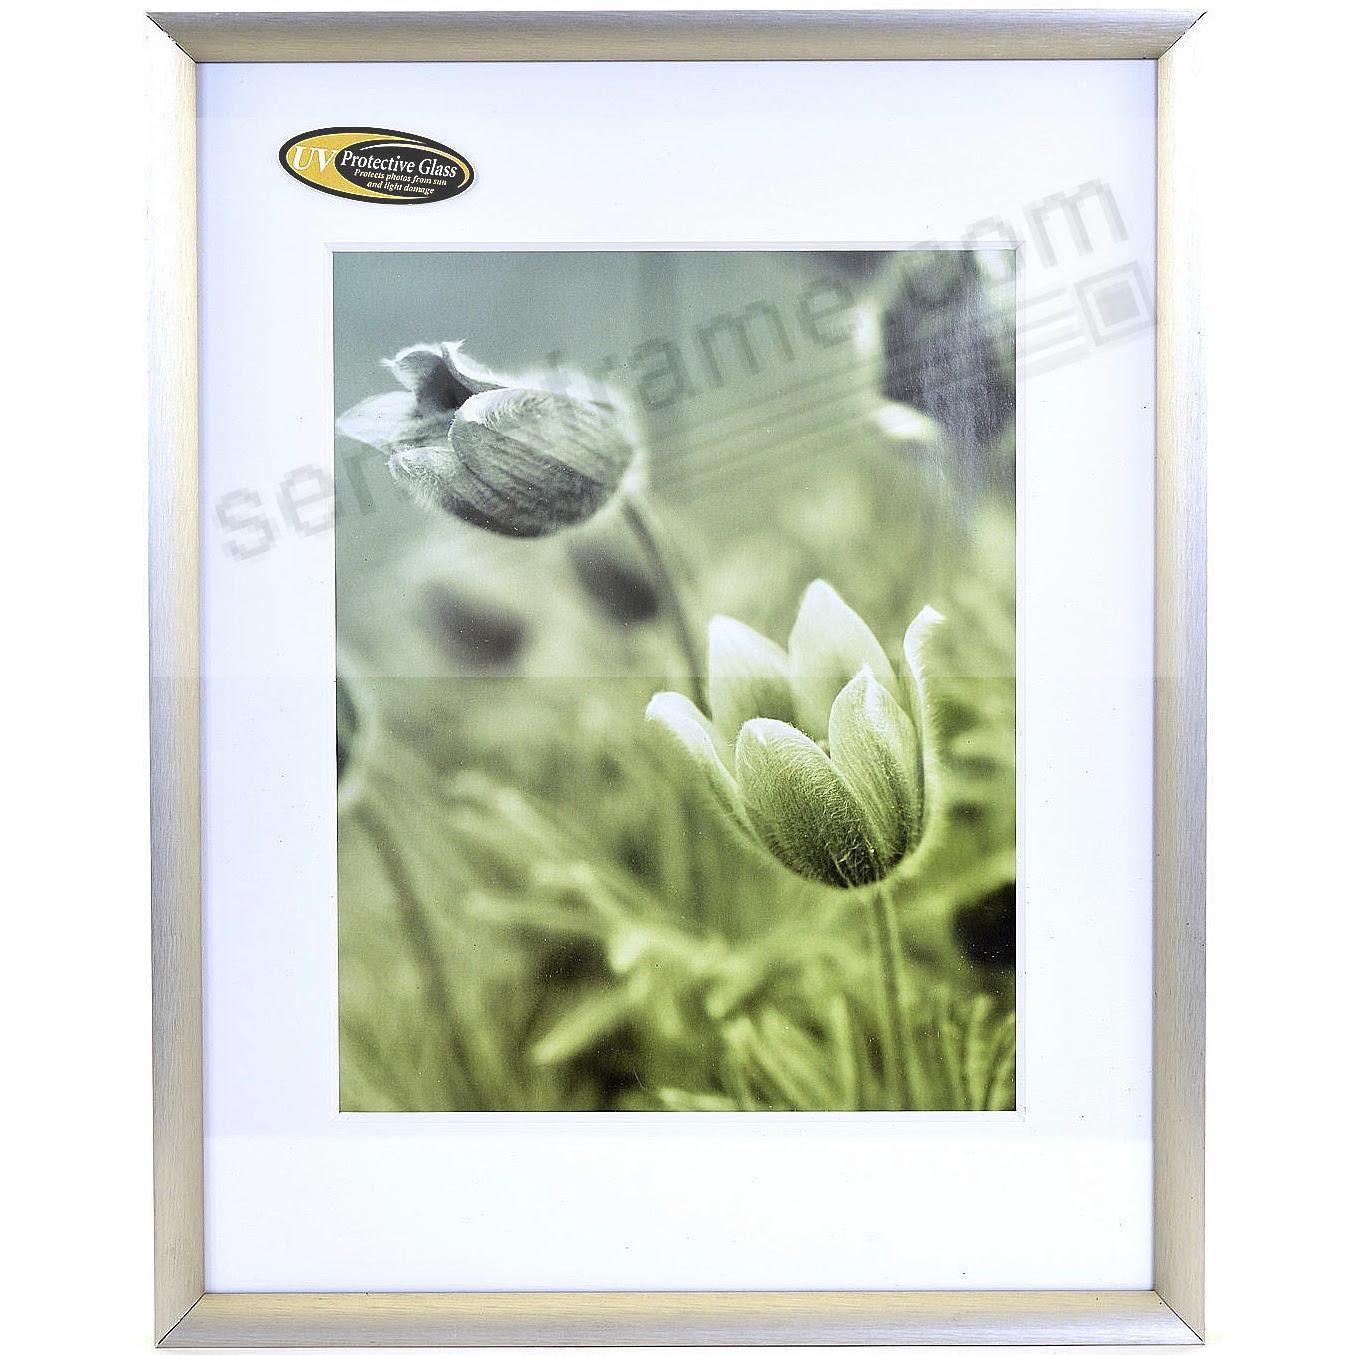 Satin German Silver Cosmopolitan Matted Metallic Frame 16x2011x14